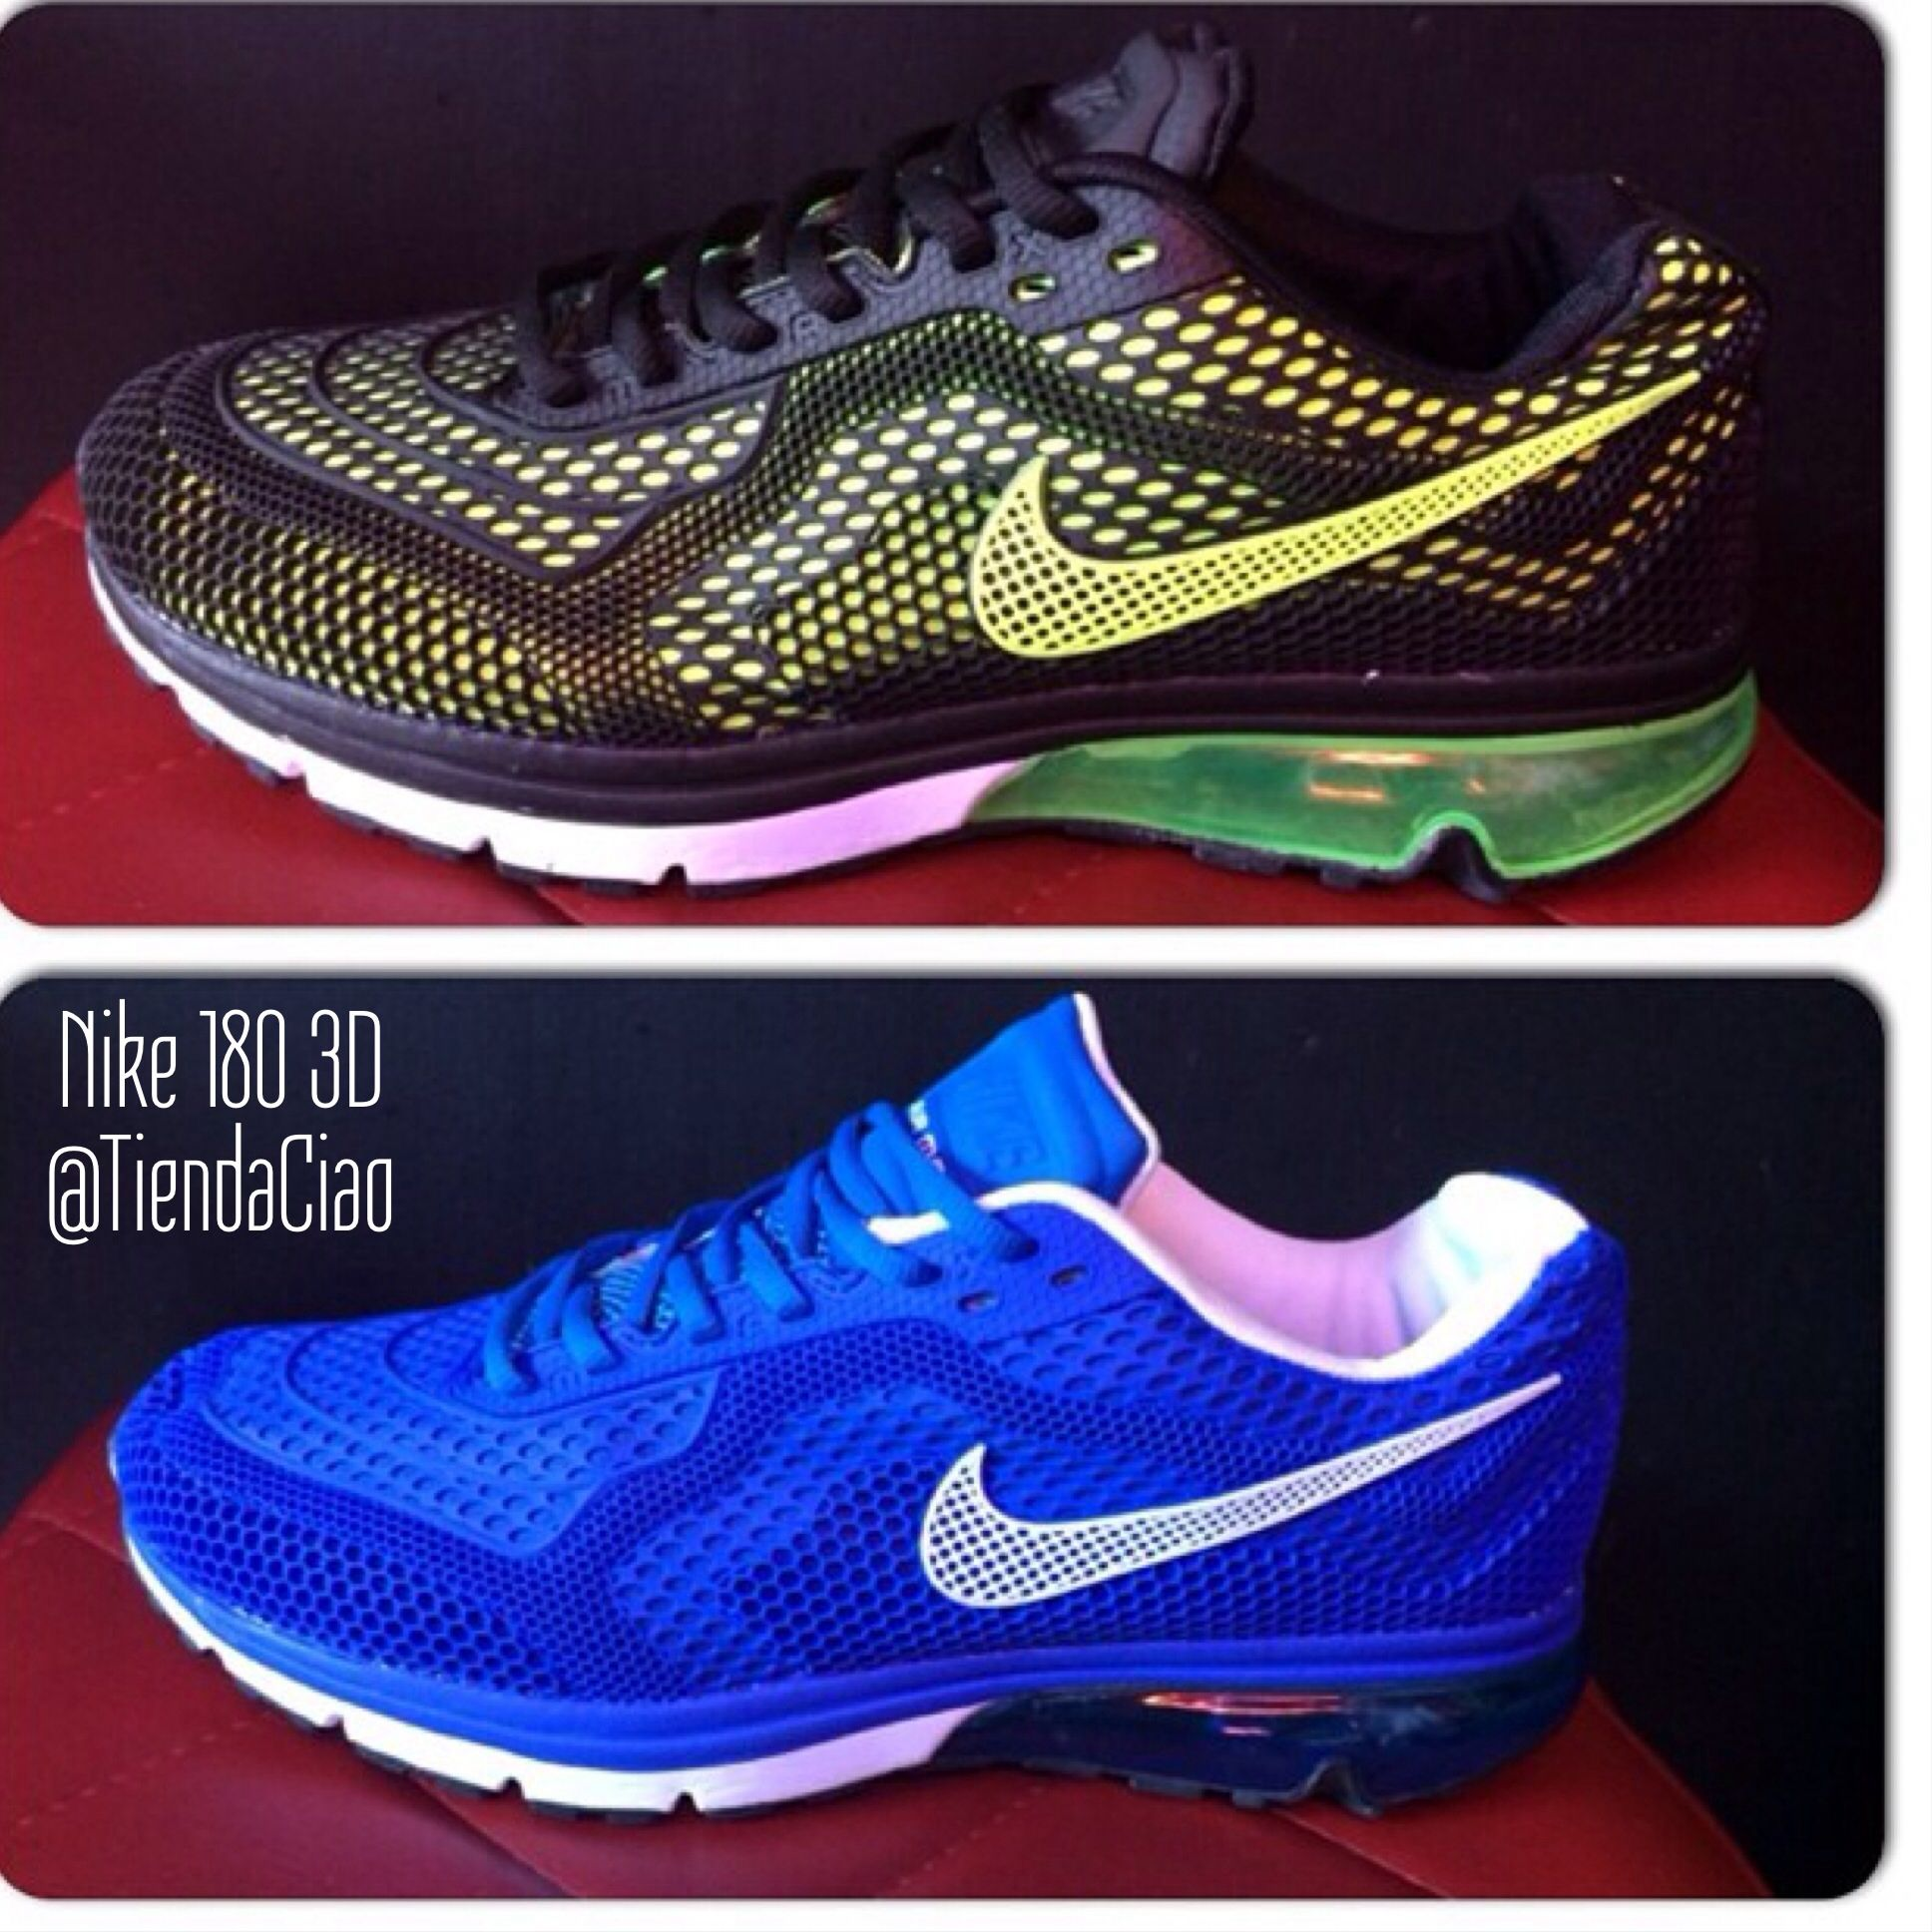 Nike 180 3D para hombre #sport #fitness #yoga #relax #tenis #nike ...